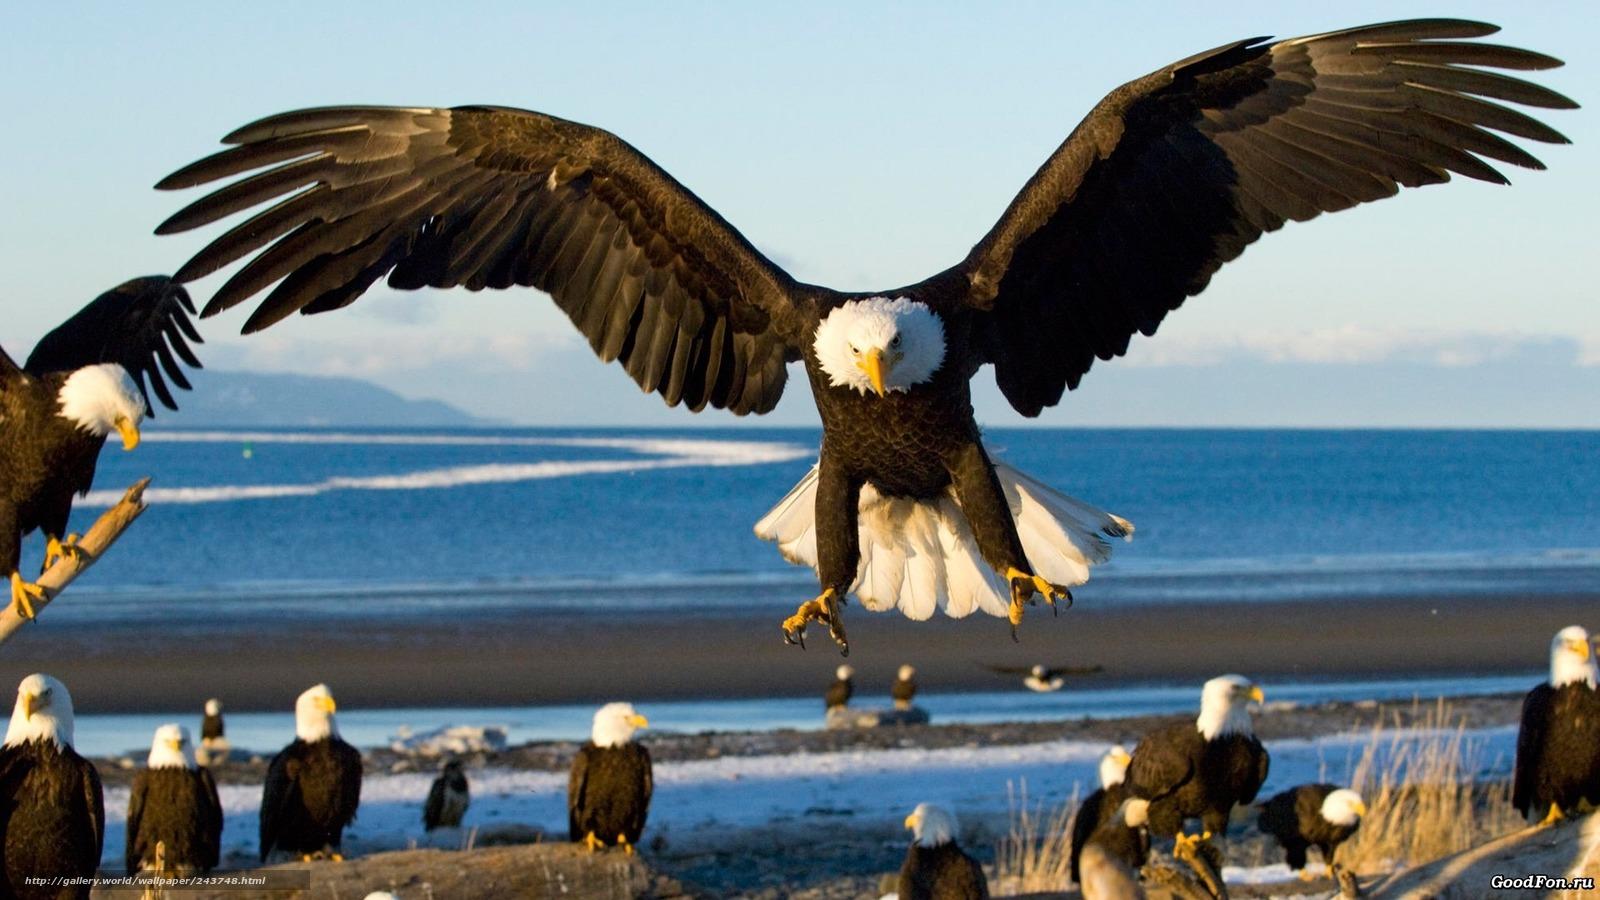 Tlcharger Fond Decran Oiseaux Aigle Mer Atterrissage Fonds